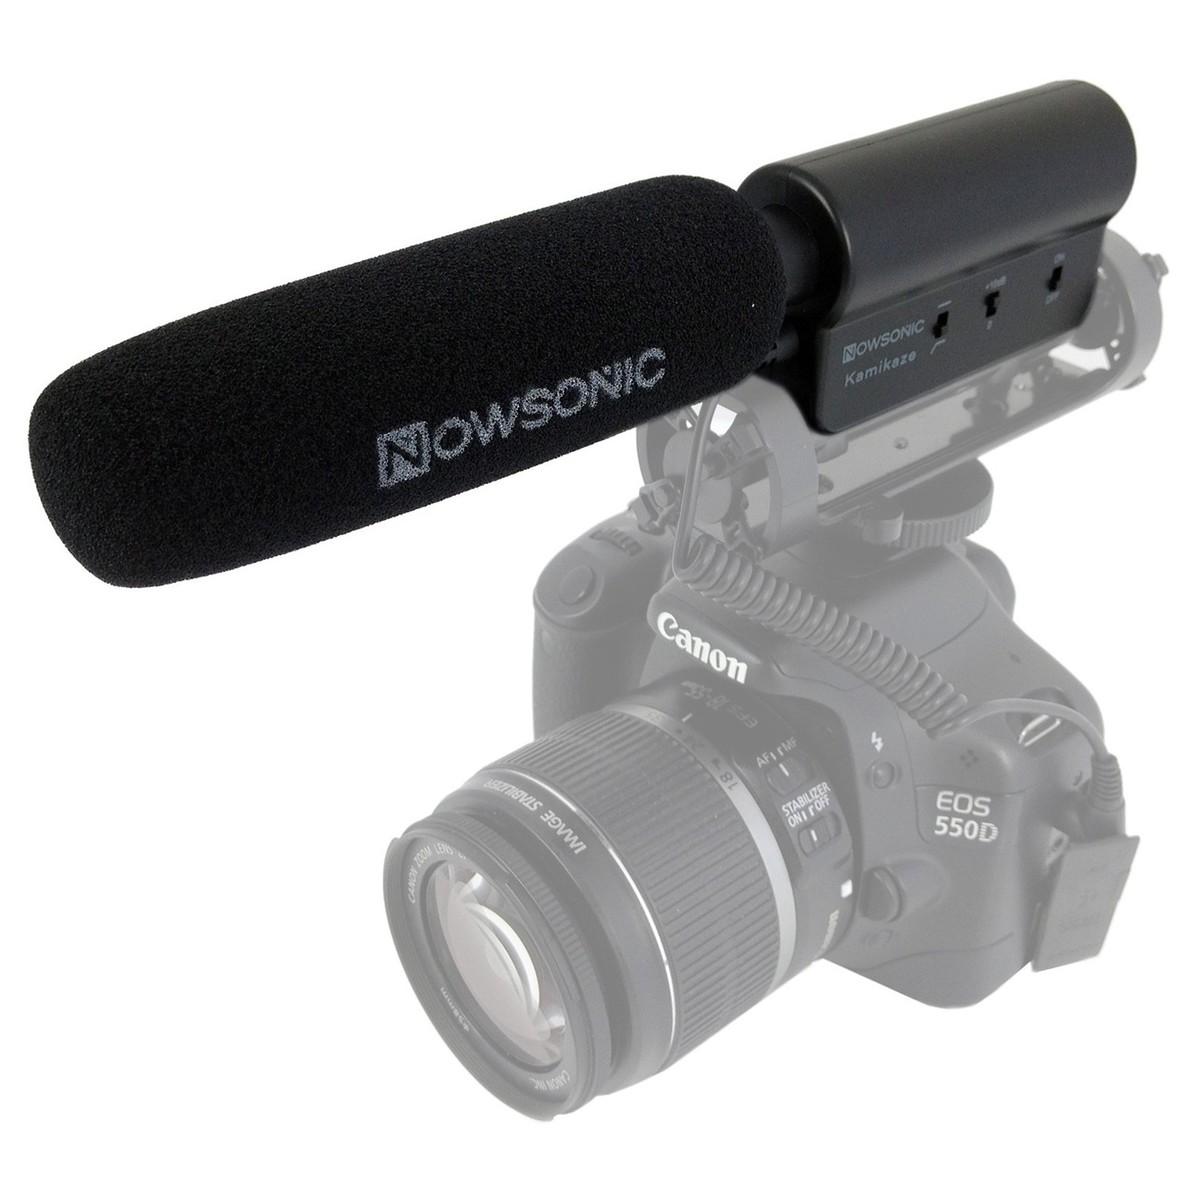 Nowsonic Kamikaze Pro Stereo Shotgun Microphone for DSLR